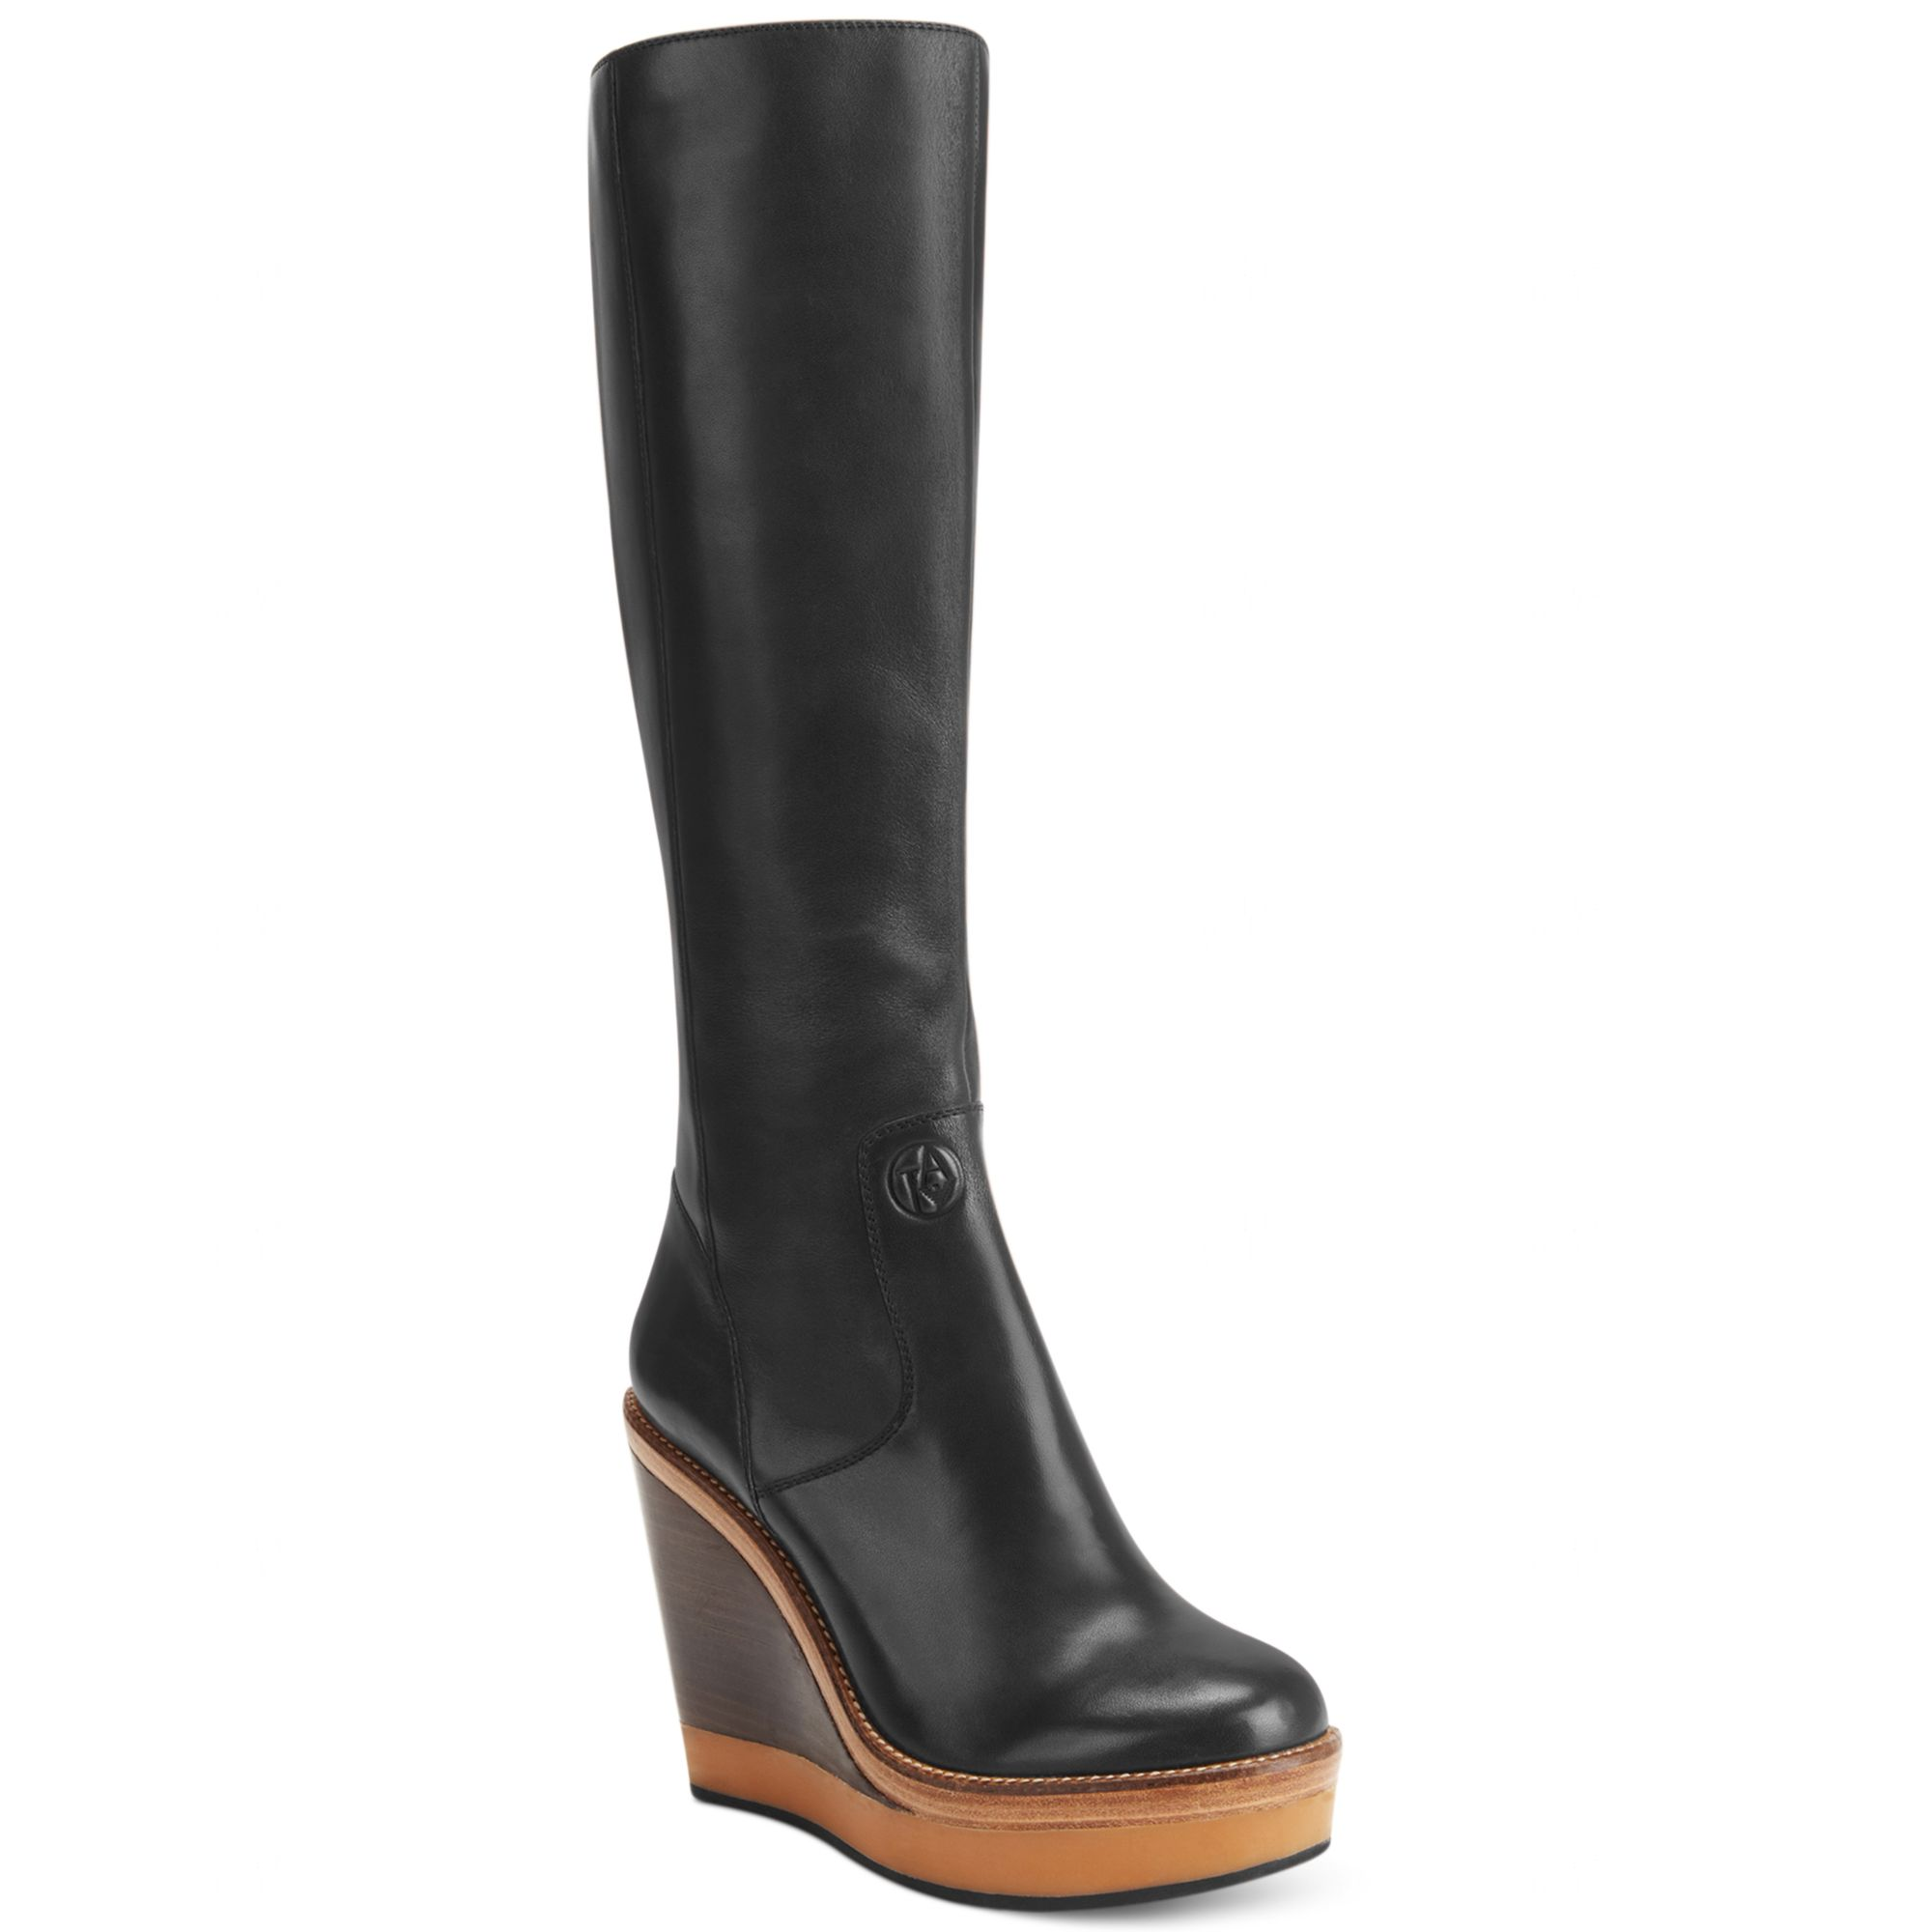 Armani Platform boots